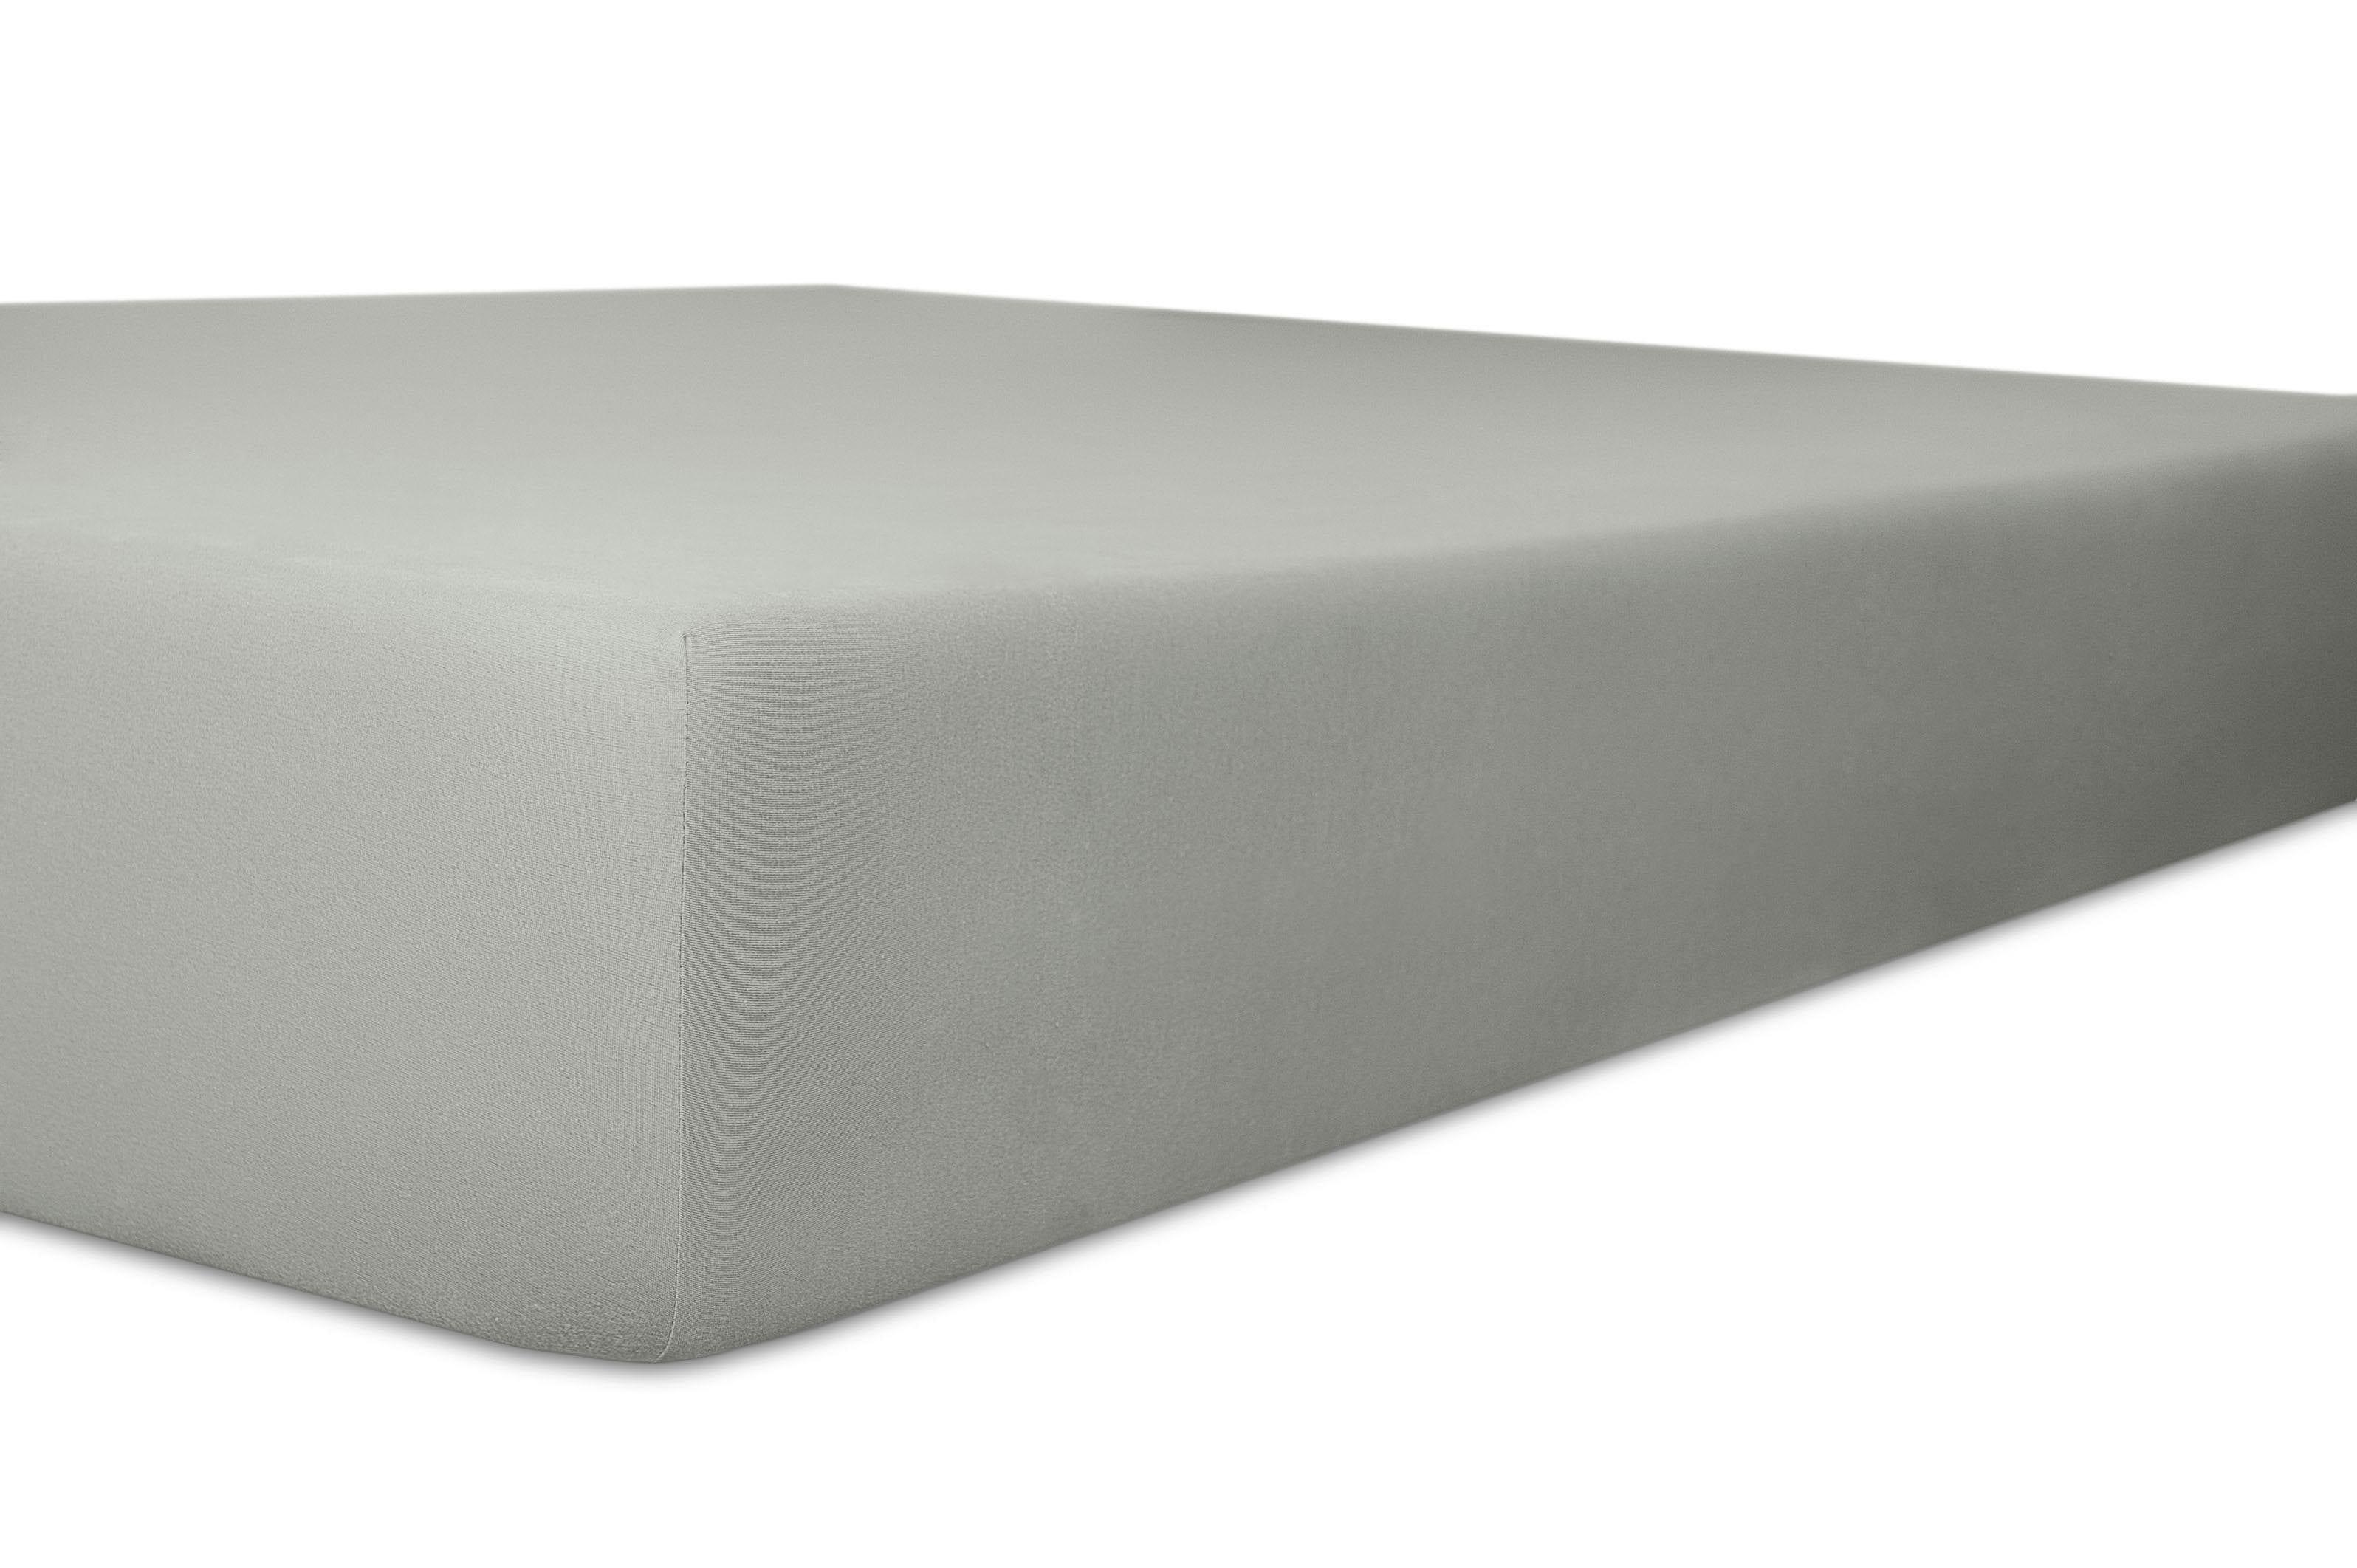 Image of Spannbettlaken »Organic-Cotton-Stretch«, Kneer